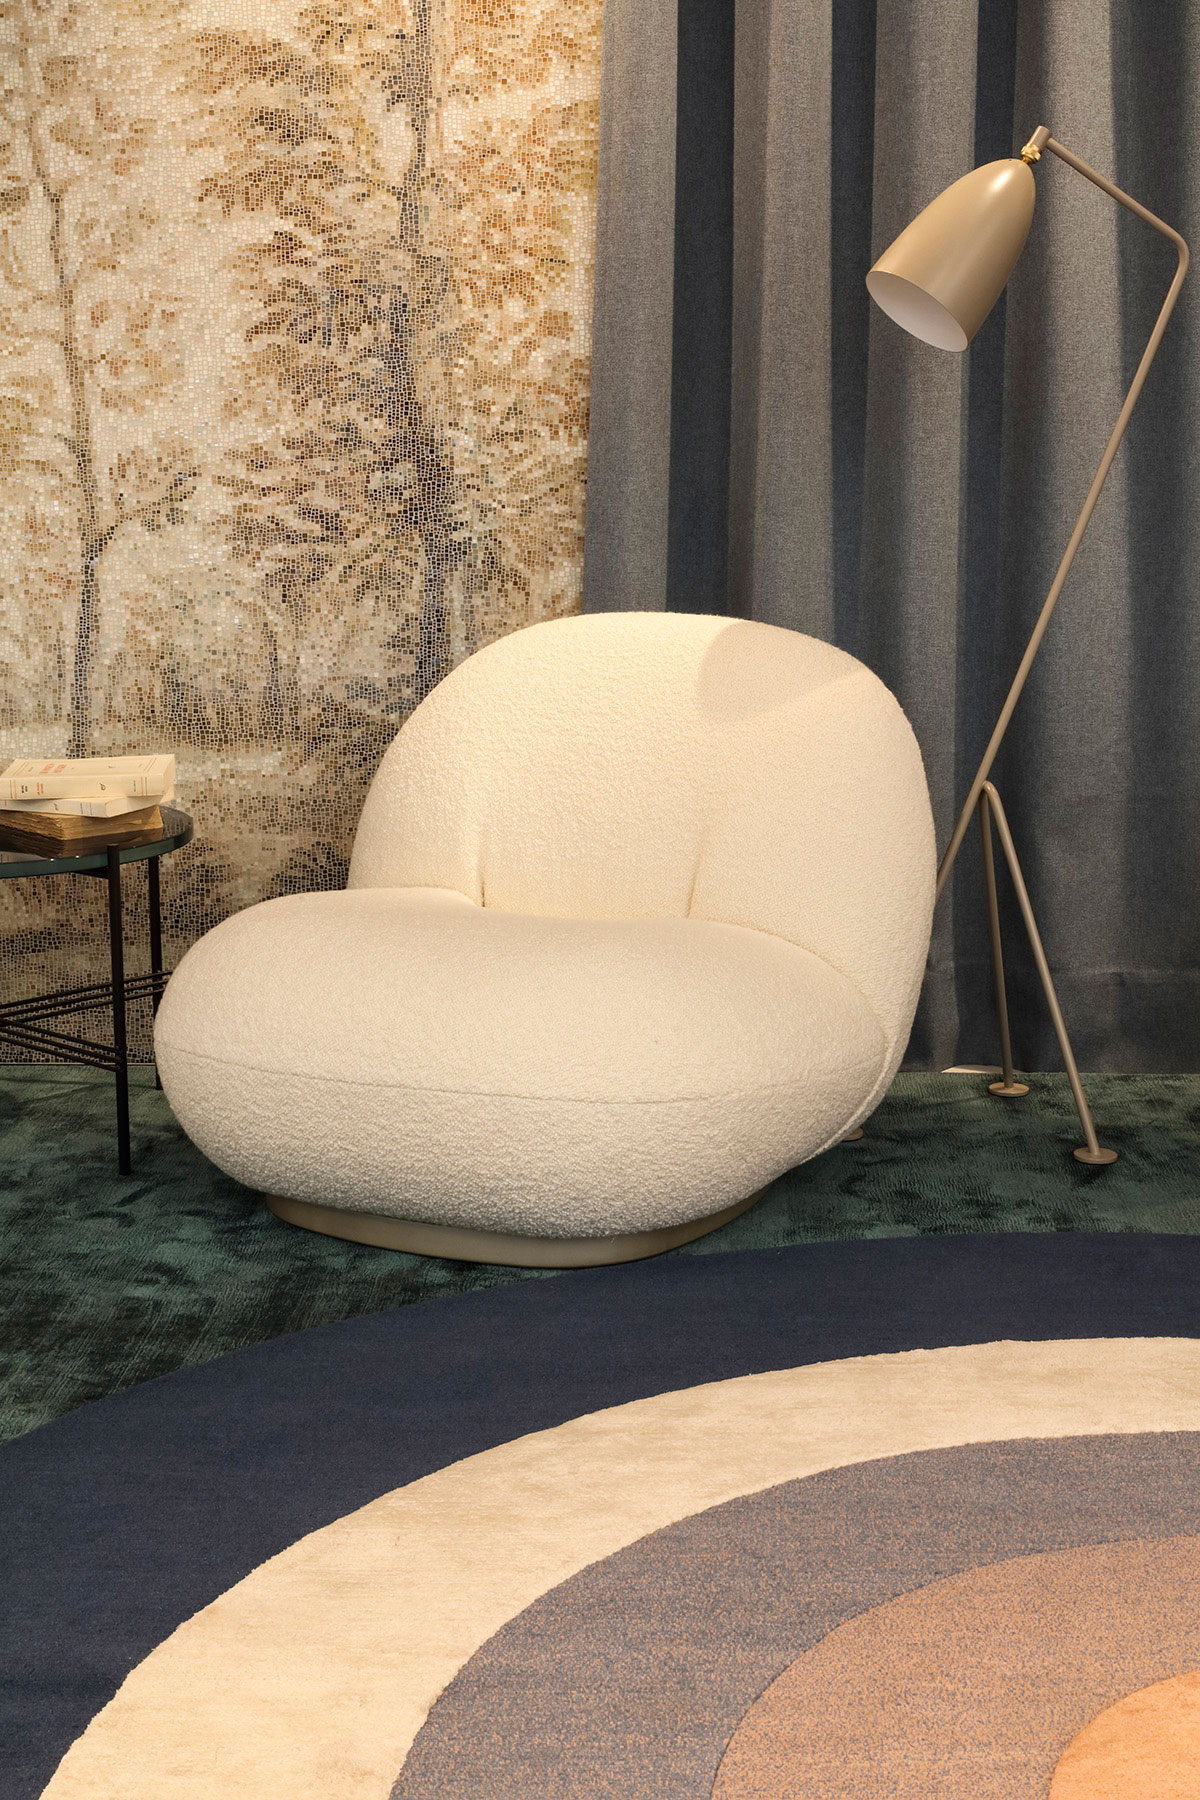 Escape Paris Beautiful Interior Design Showrooms In Lyon: Claude Cartier Decoration Inside Gallery - www.AuthenticInterior.com INTERIOR DESIGN BLOG.jpg